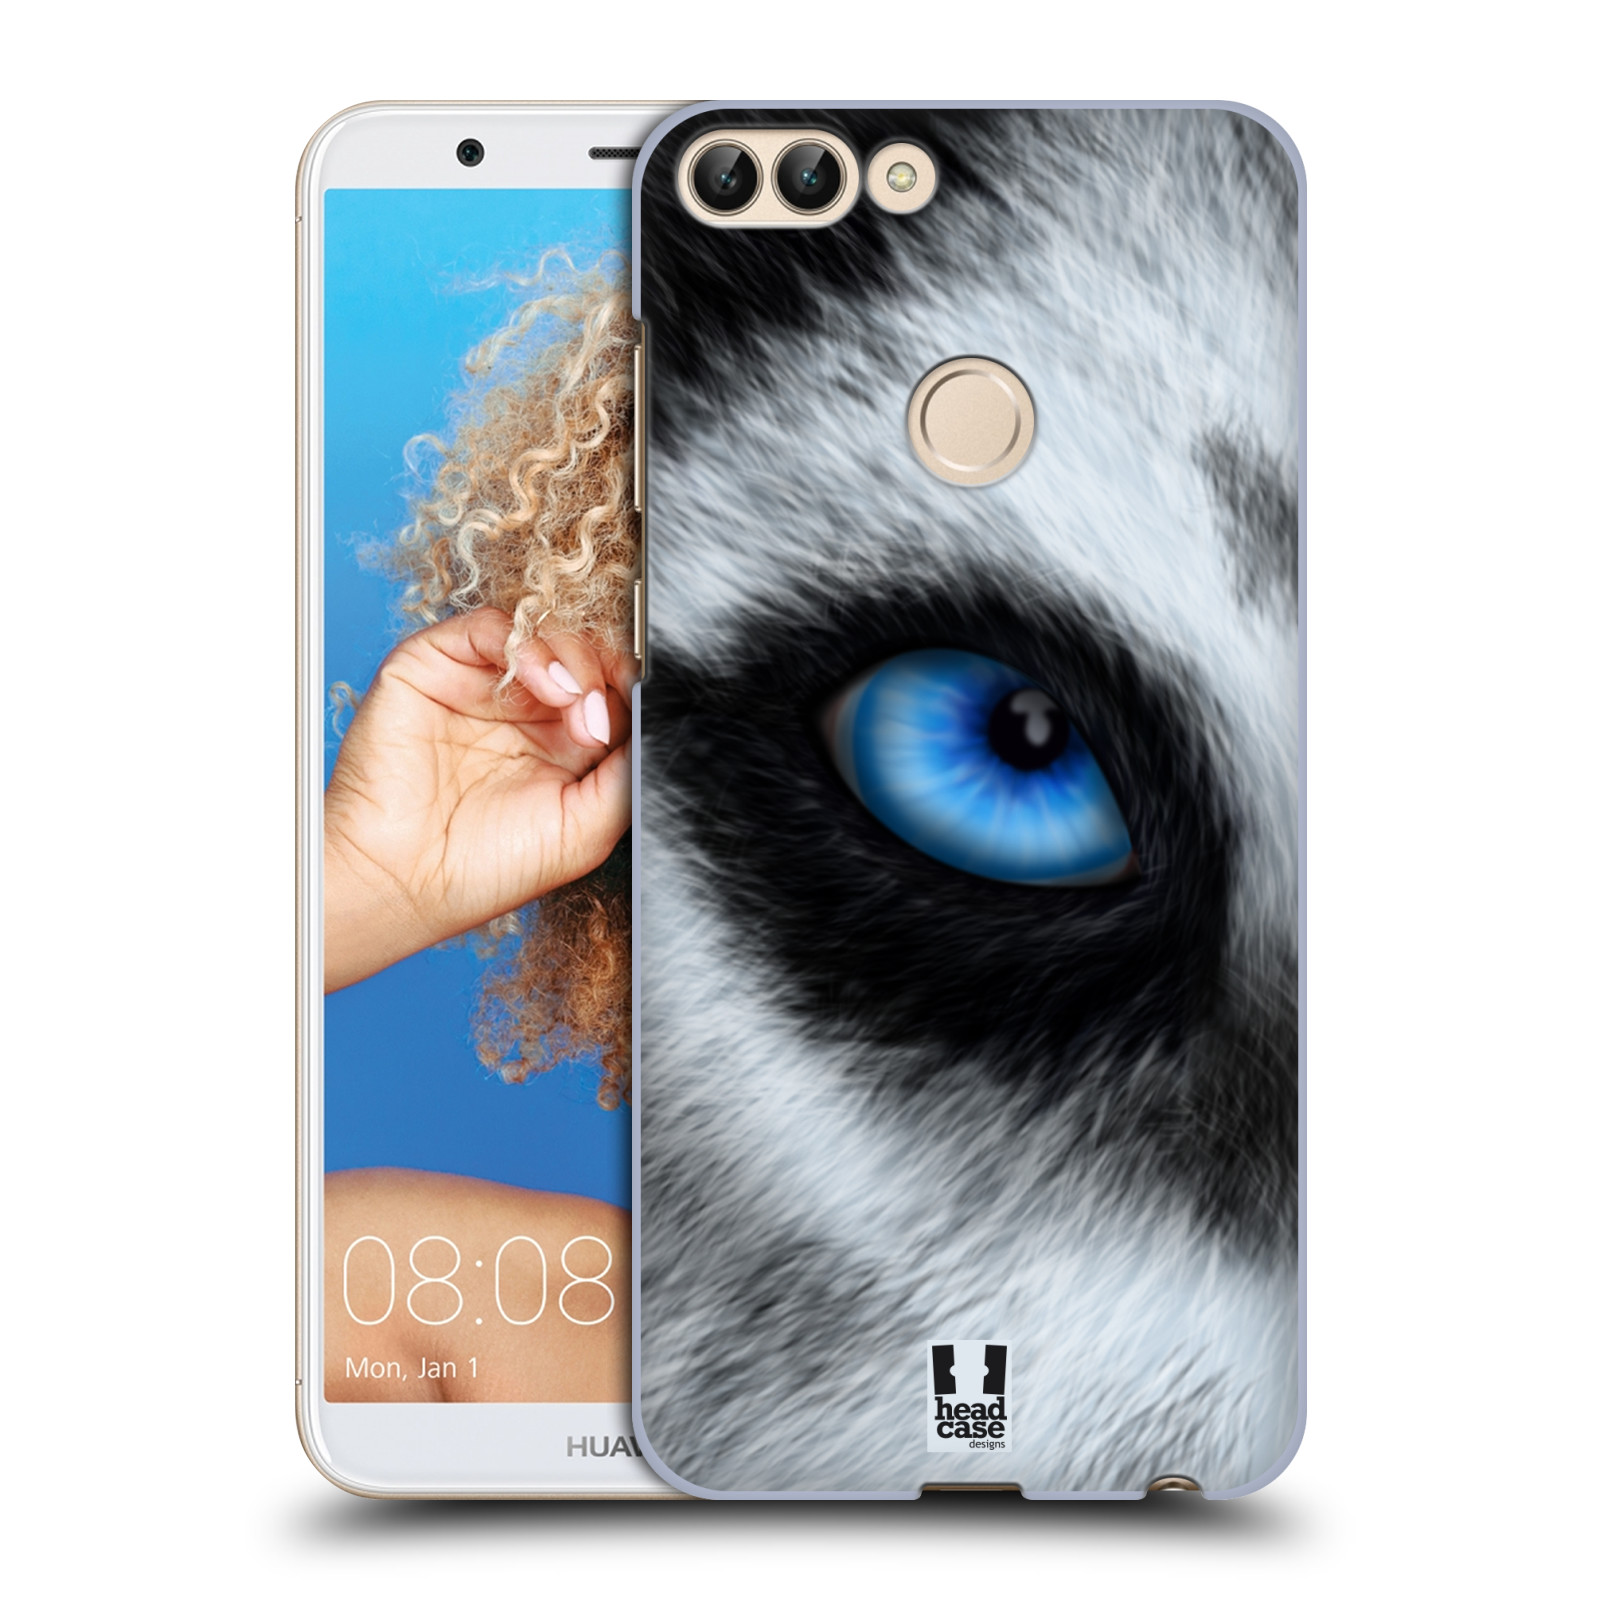 HEAD CASE plastový obal na mobil Huawei P Smart vzor pohled zvířete oko pes husky